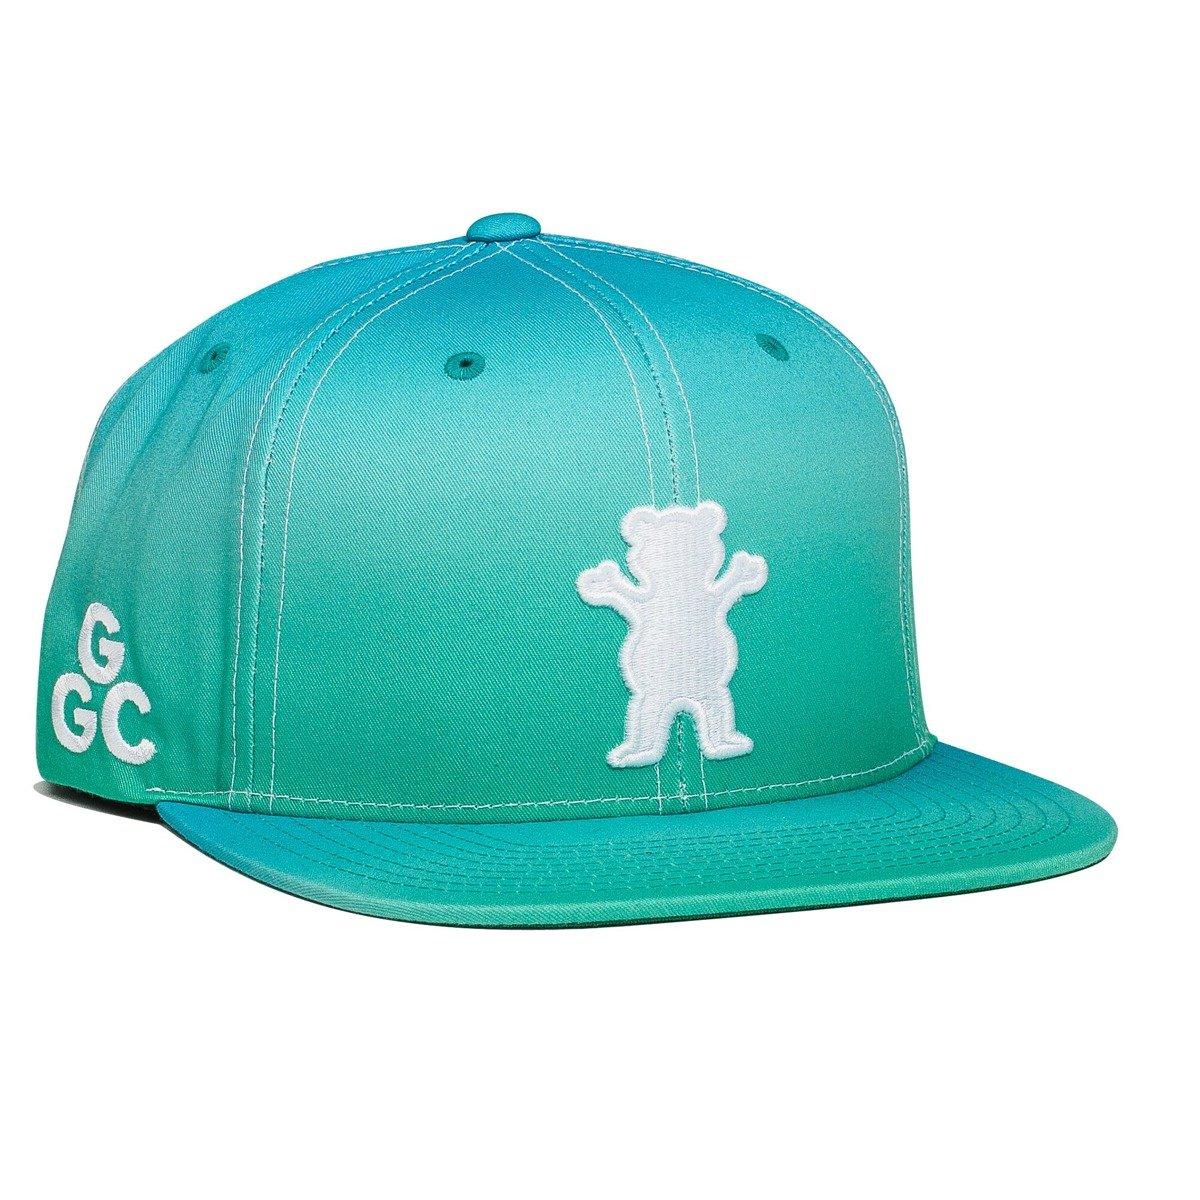 half off 0fcdc d3534 CZAPKA GRIZZLY OG BEAR TRUCKER SNAPBACK green   Clothes   Cap   Cap SALE    Sale 50% -70%   Cap Brands   Grizzly Griptape Promo Set   Grizzly Griptape  Odzież ...